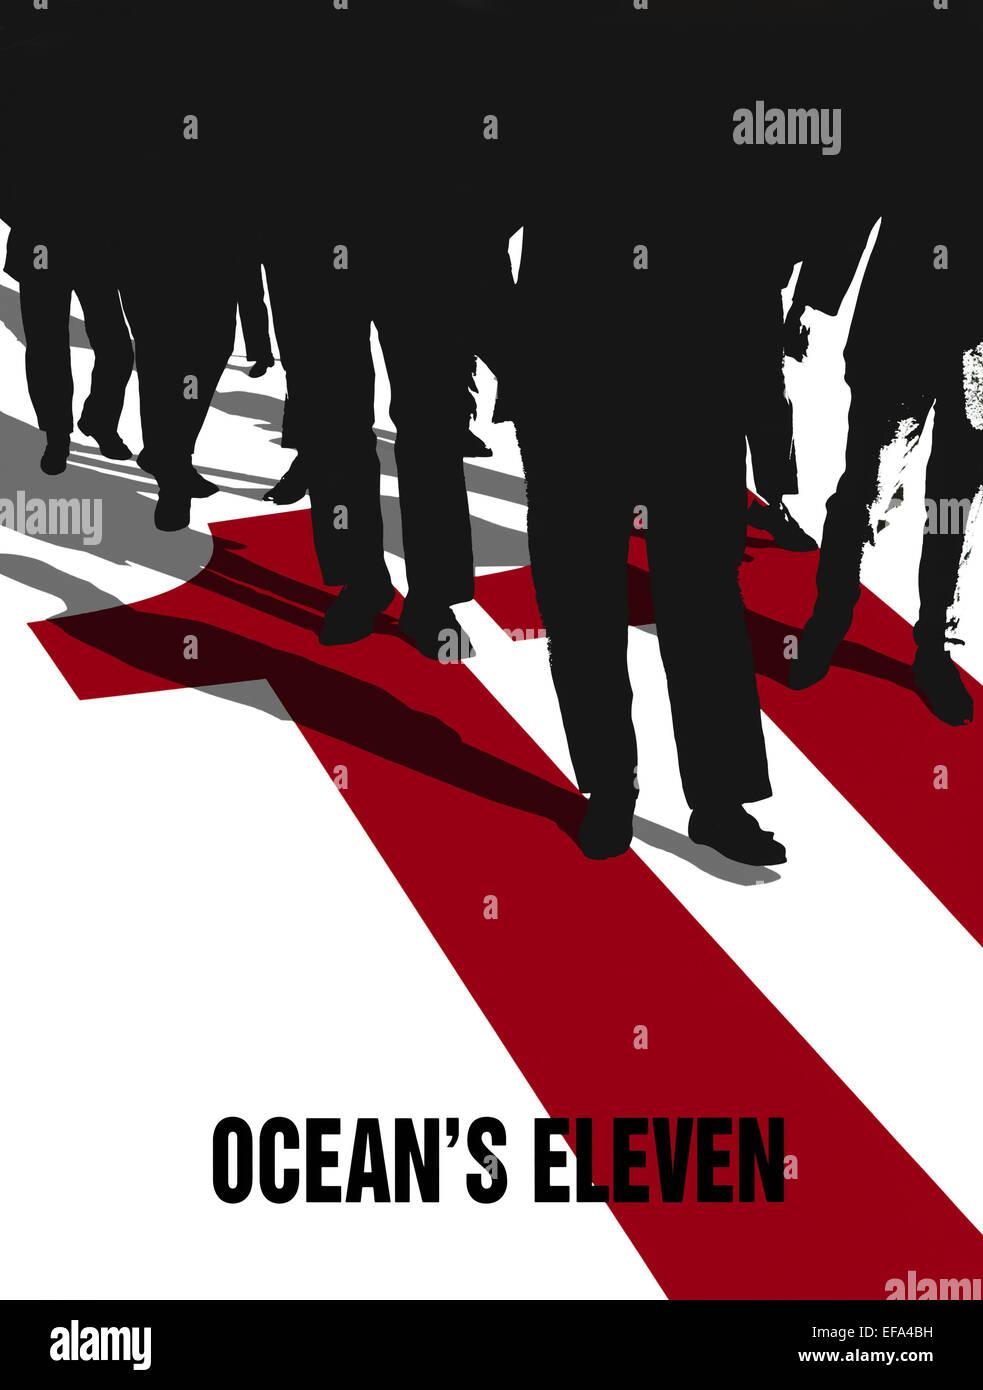 FILM ARTWORK OCEAN'S ELEVEN (2001) - Stock Image